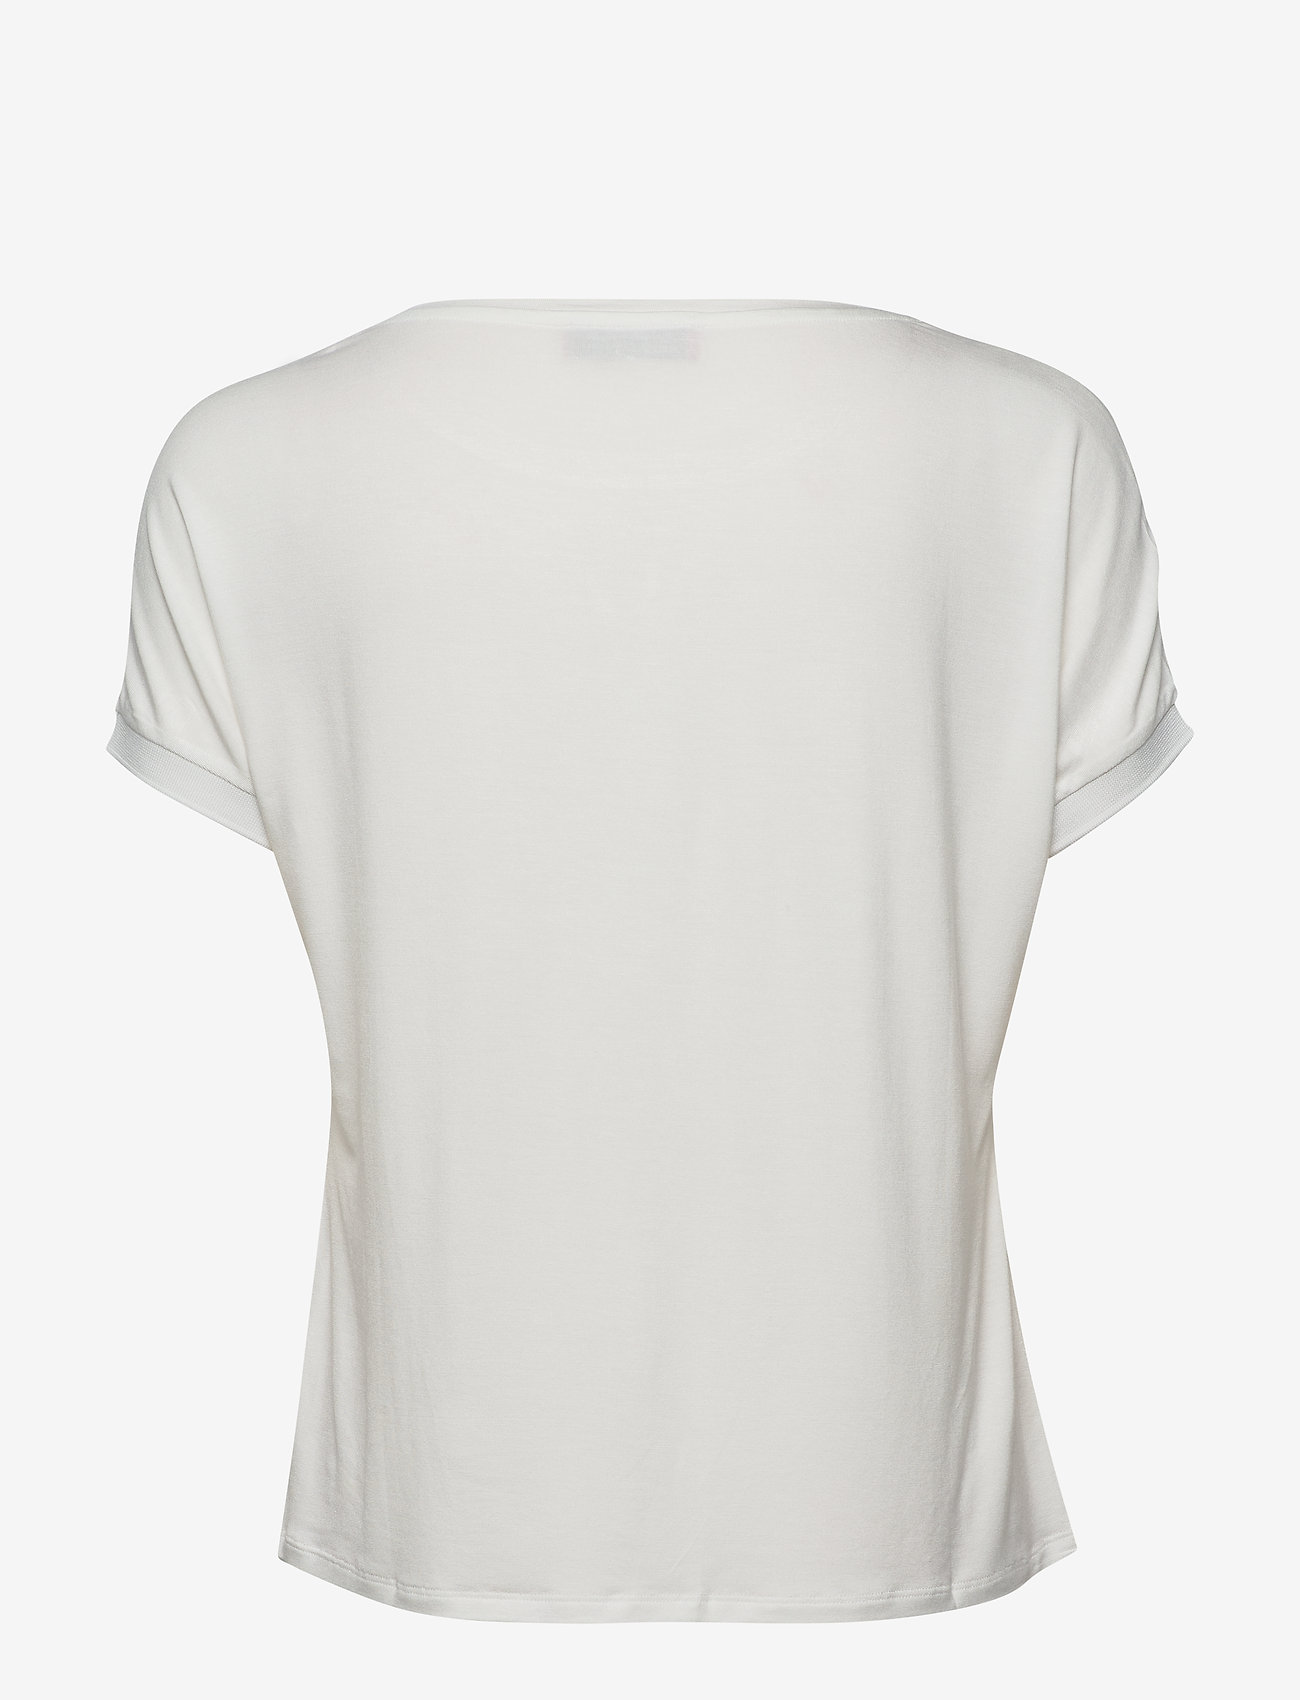 Max&Co. - CREDERE - t-shirts - white - 1